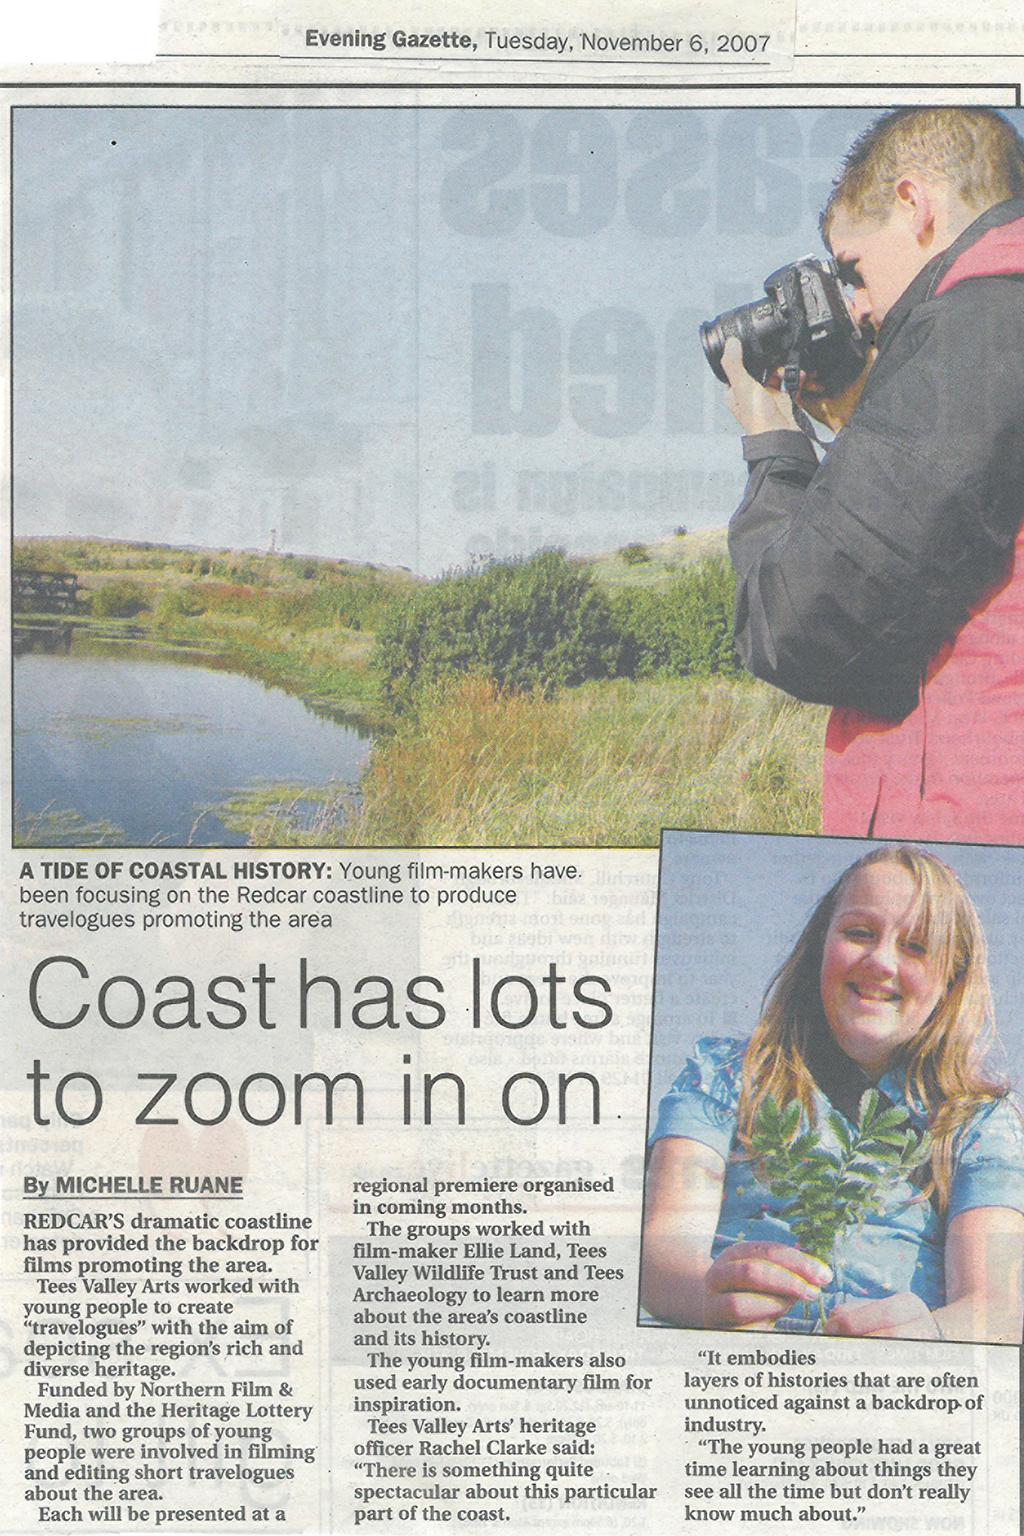 2007-11-06, evening gazette